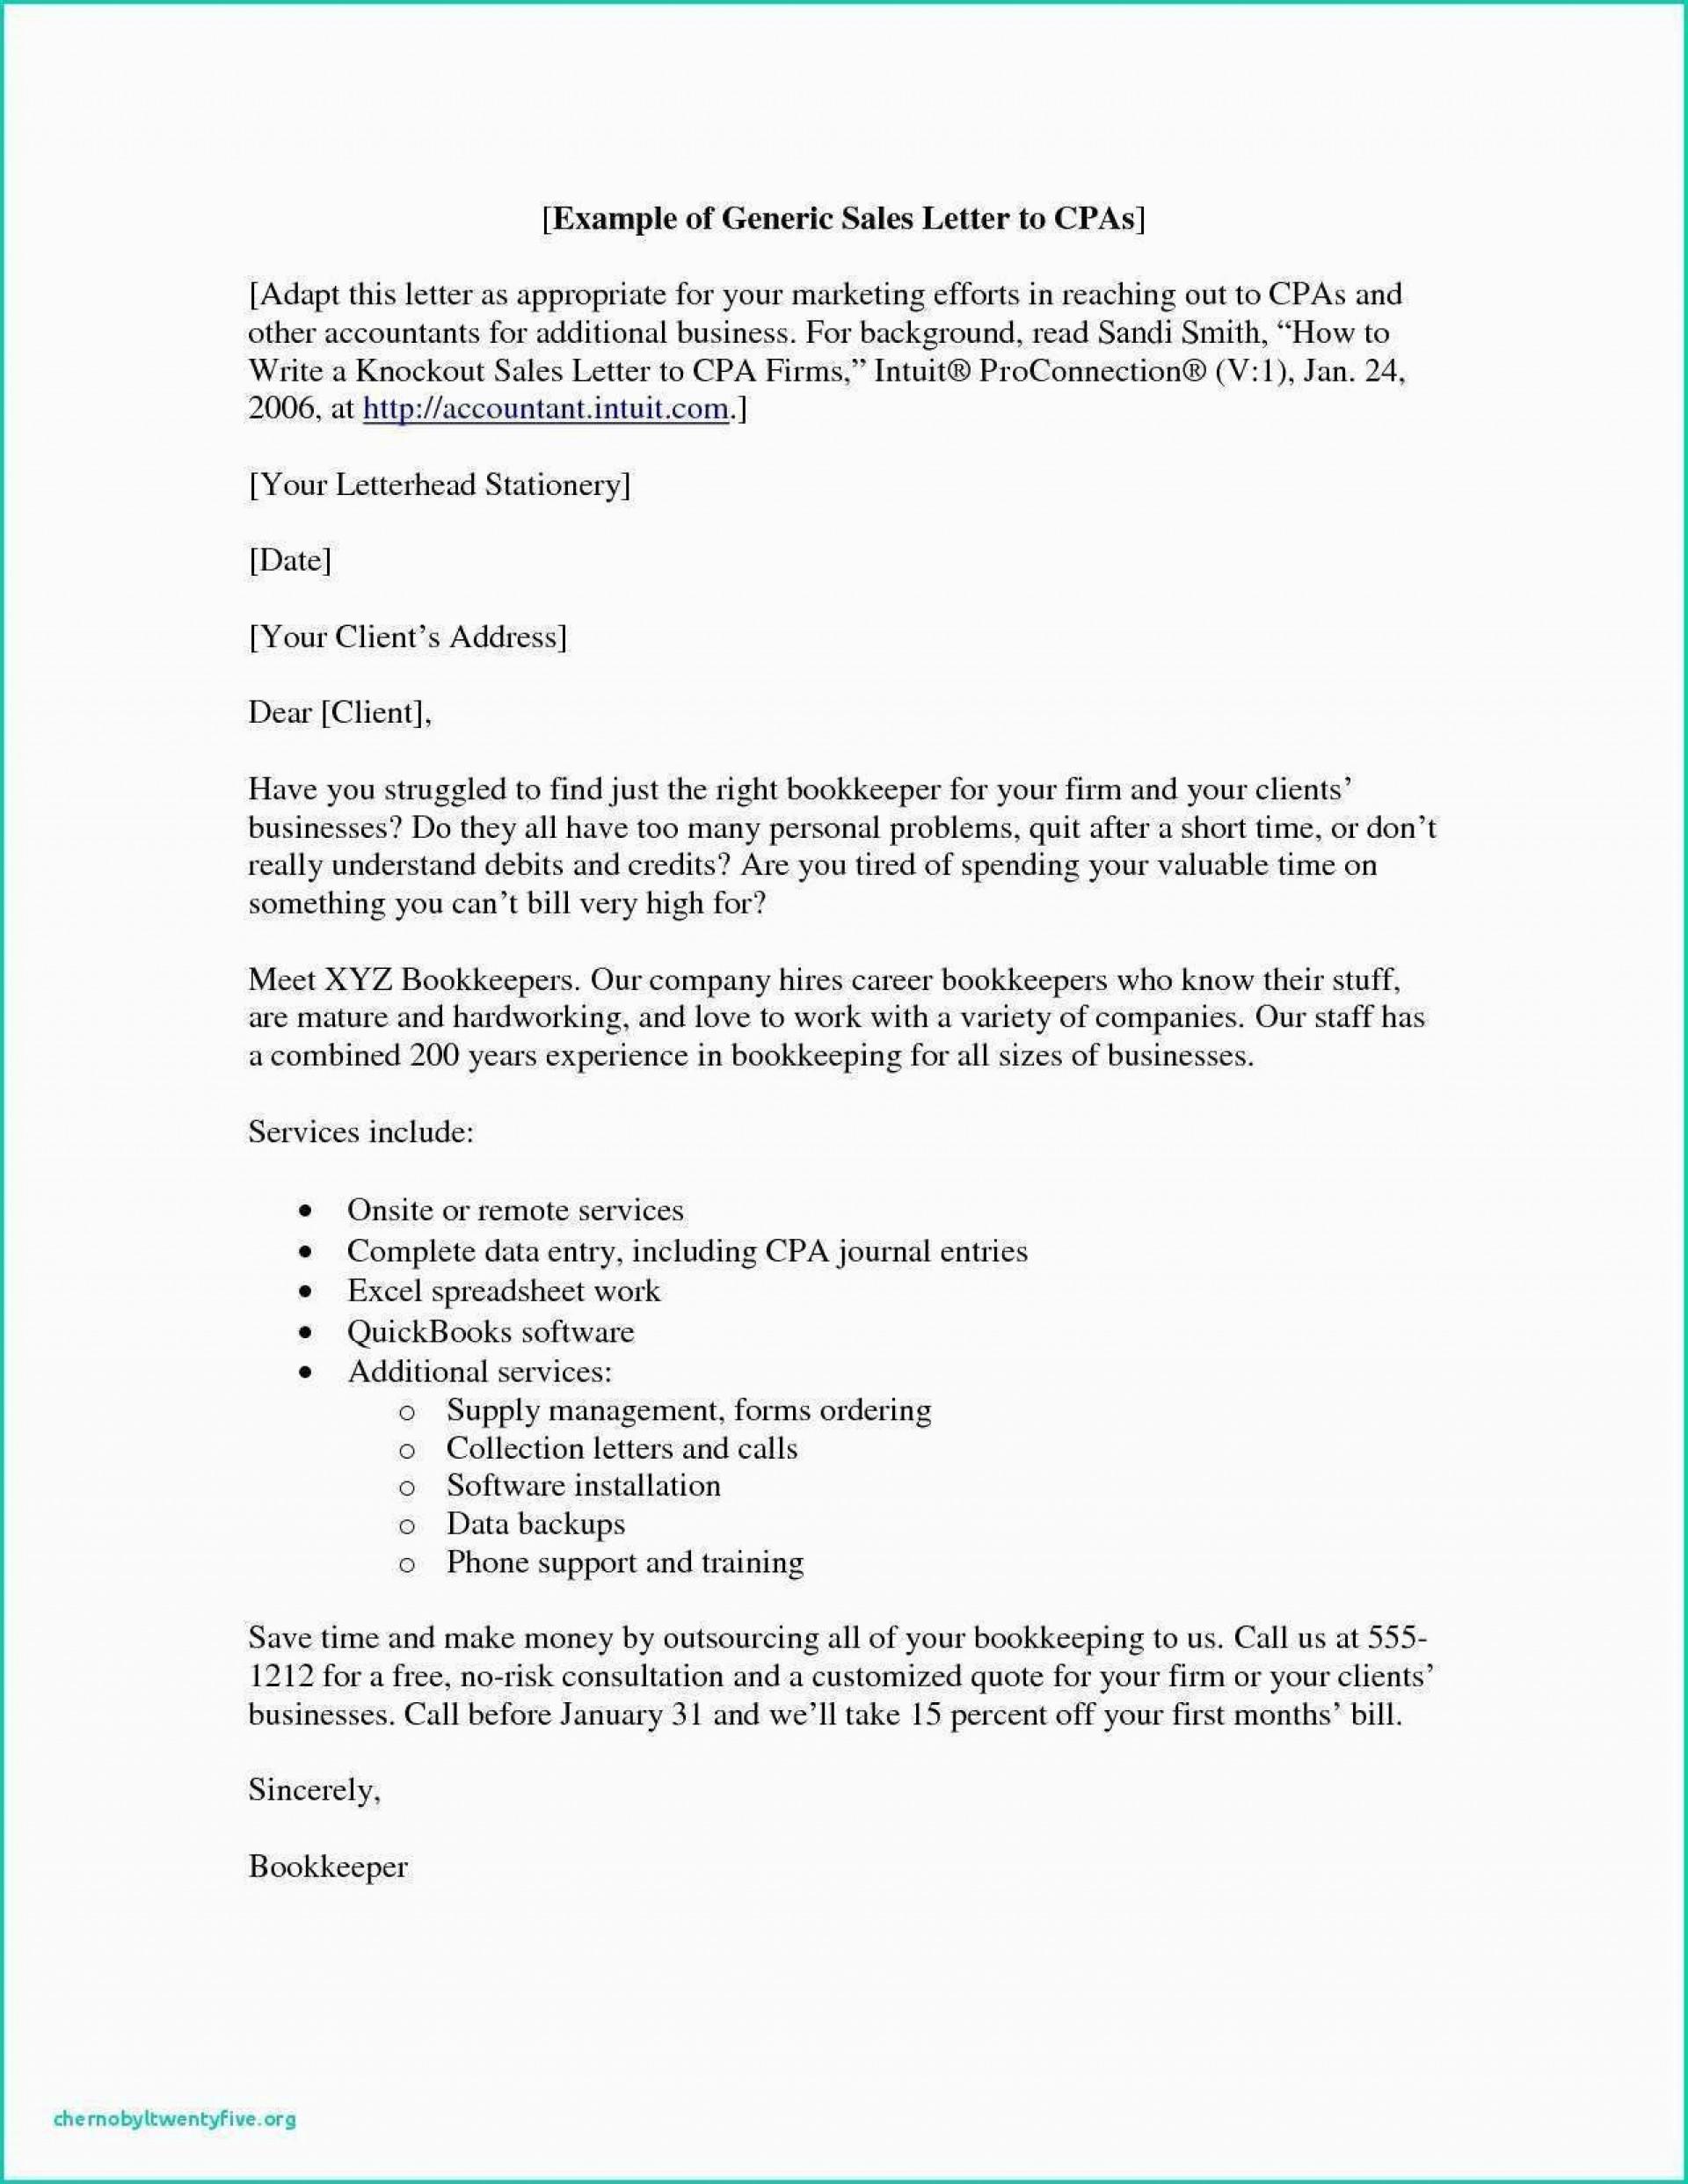 005 Stupendou Real Estate Marketing Letter Template Image  Templates1920